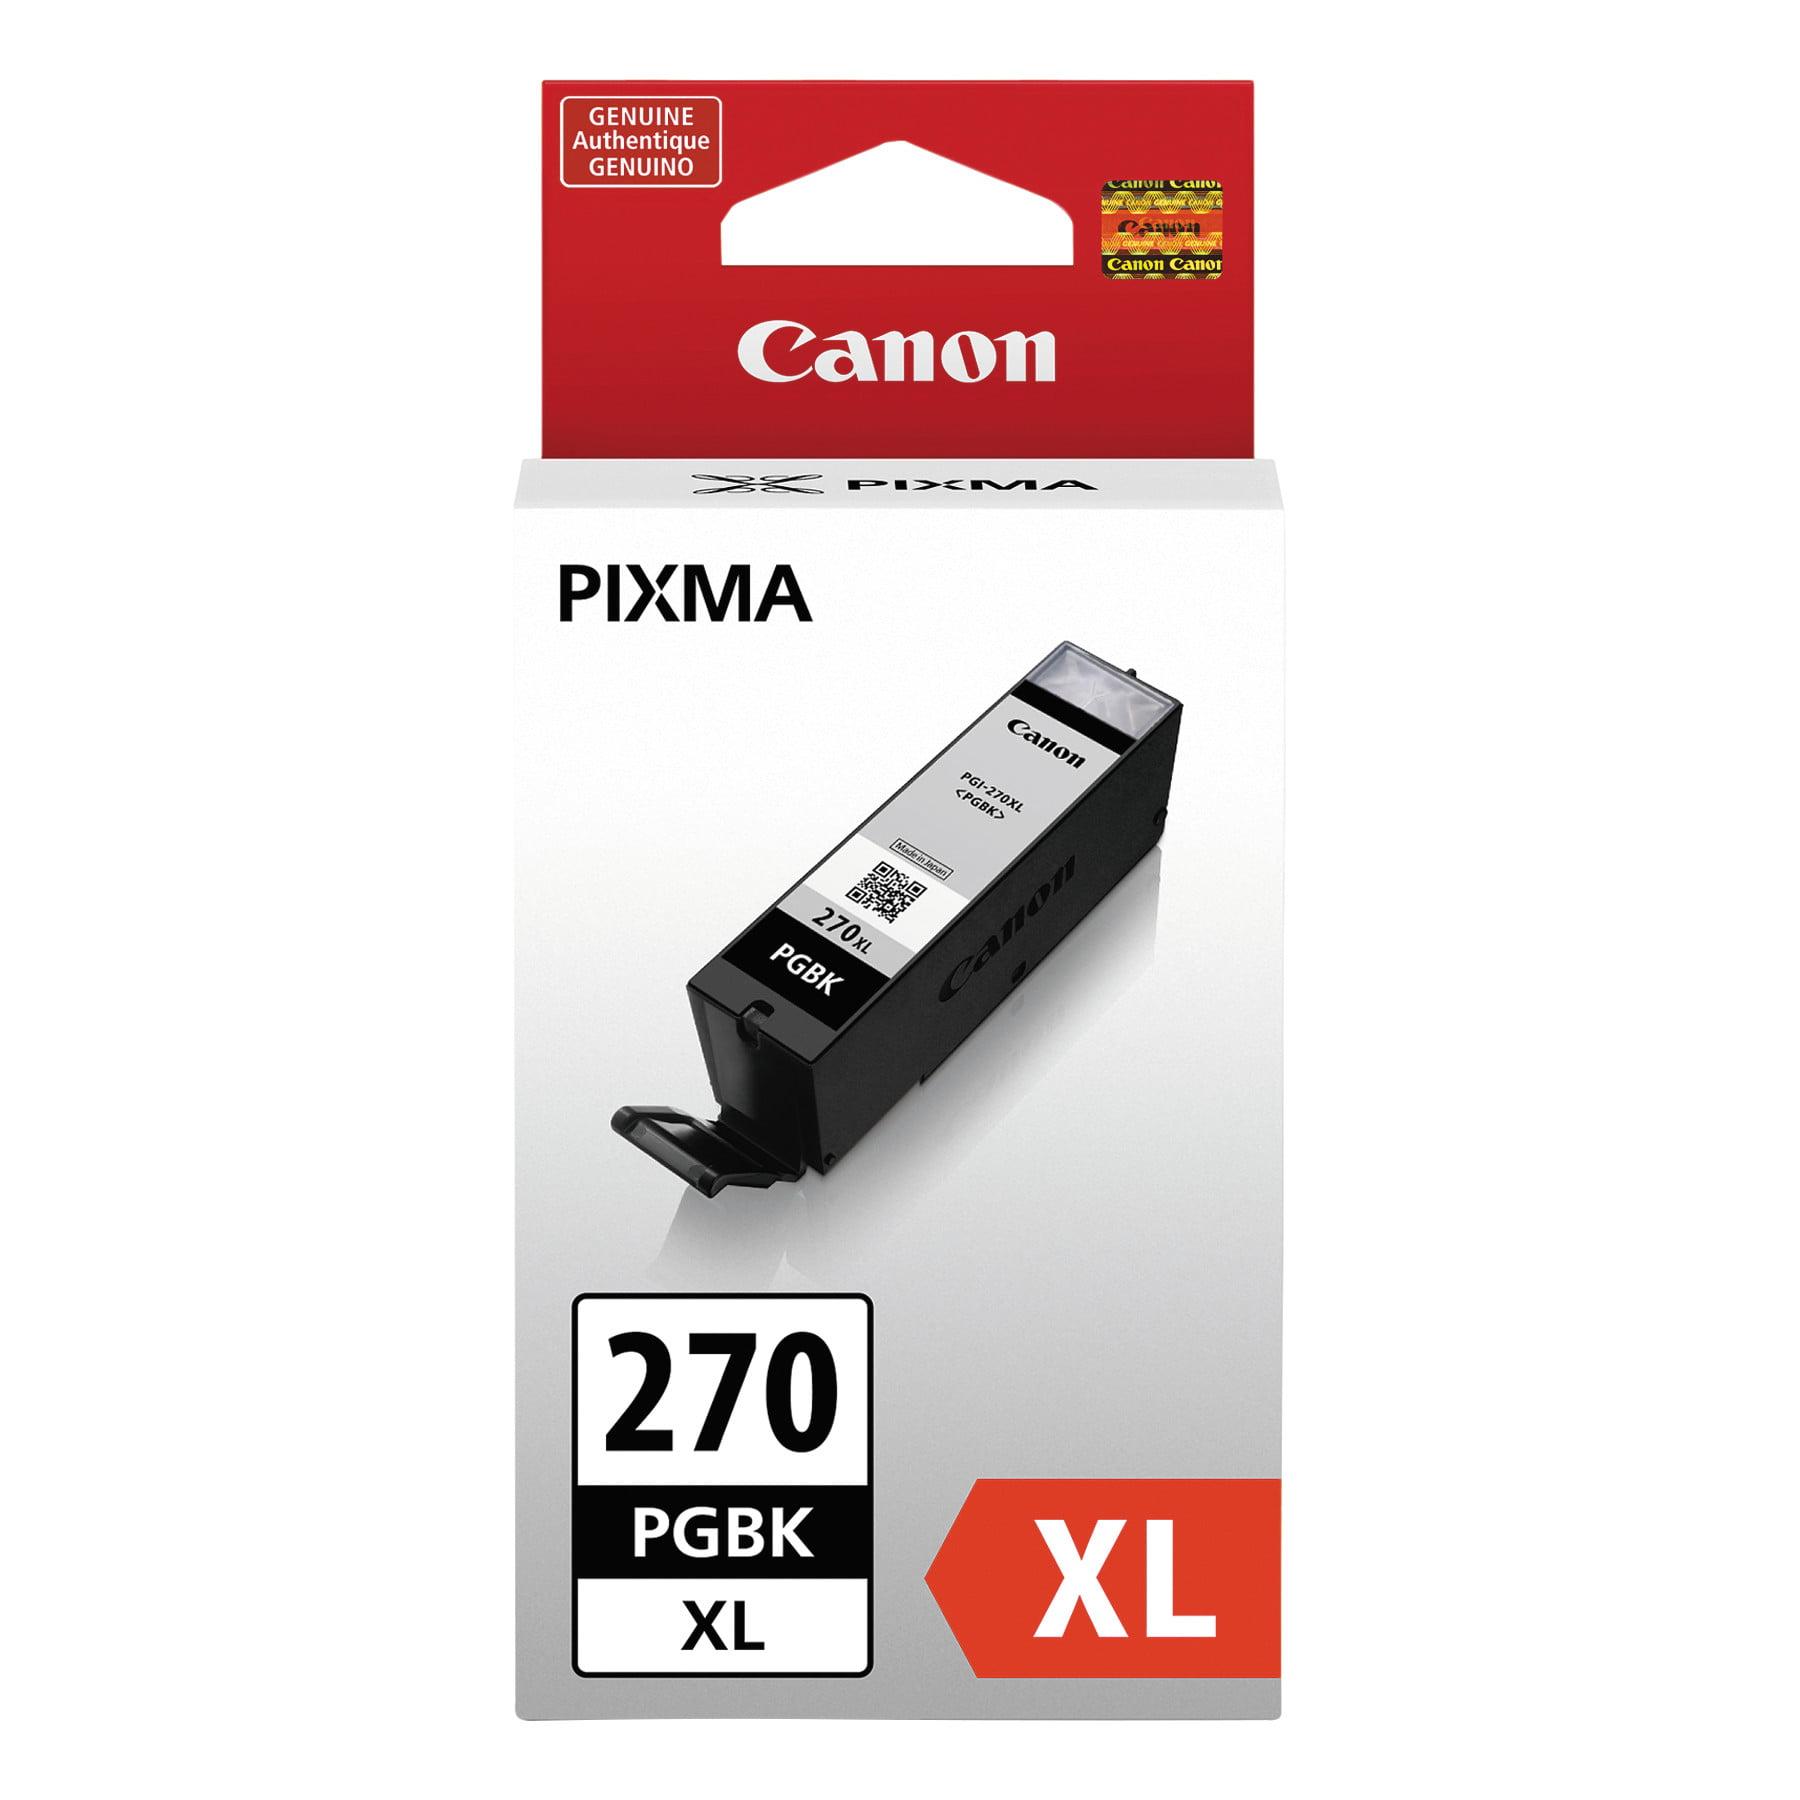 Canon 0319C001 (PGI-270XL) High-Yield Ink, Pigment Black